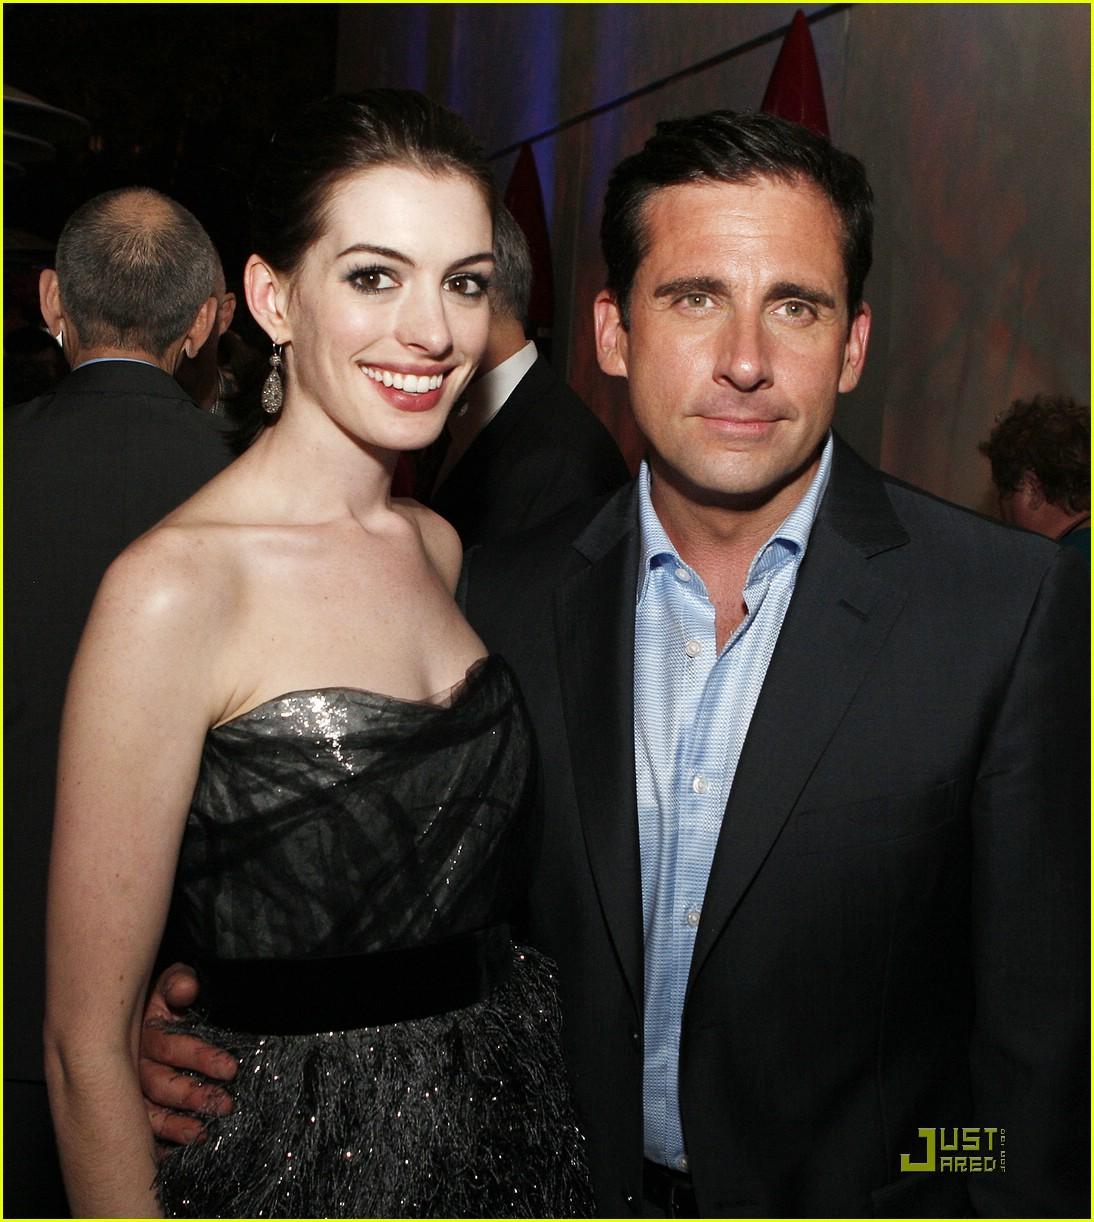 Anne Hathaway Get Smart: Whose Anne Hathaway Dating